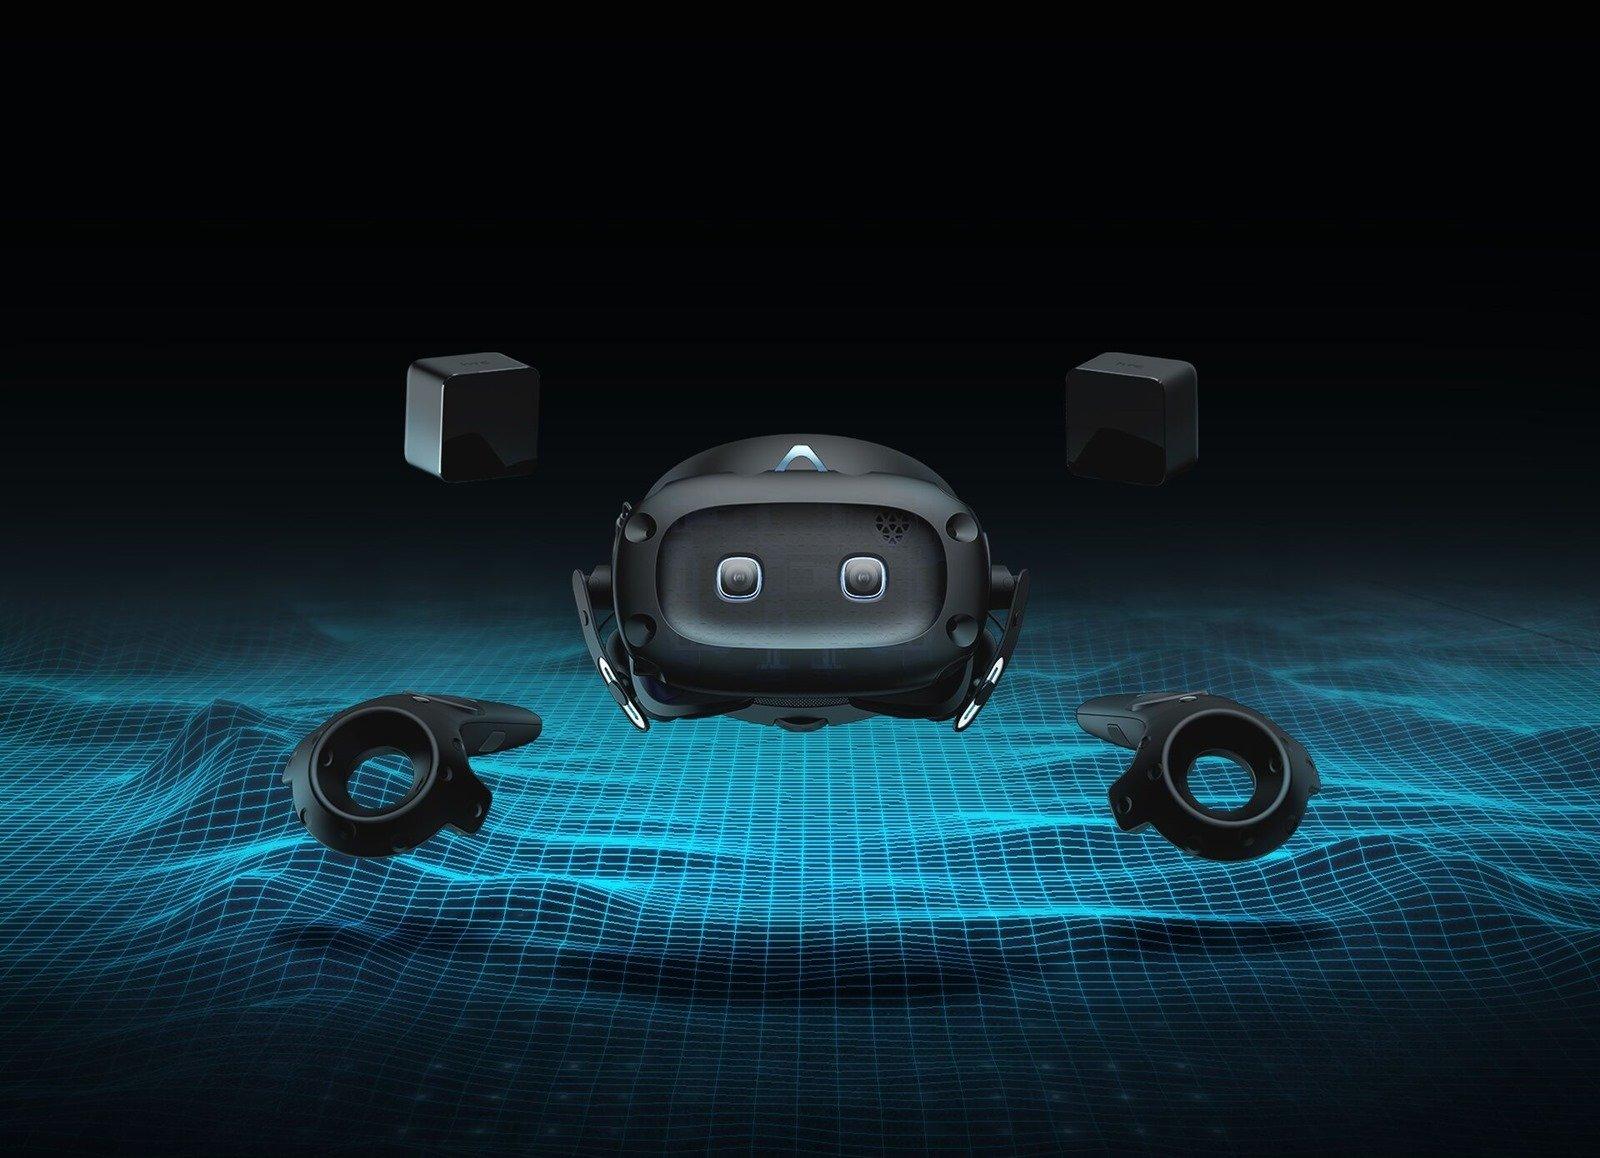 htc 揭開 VIVE COSMOS 完整系列,正式推出 VIVE Cosmos Elite、VIVE Cosmos XR 及 VIVE Cosmos Play @3C 達人廖阿輝